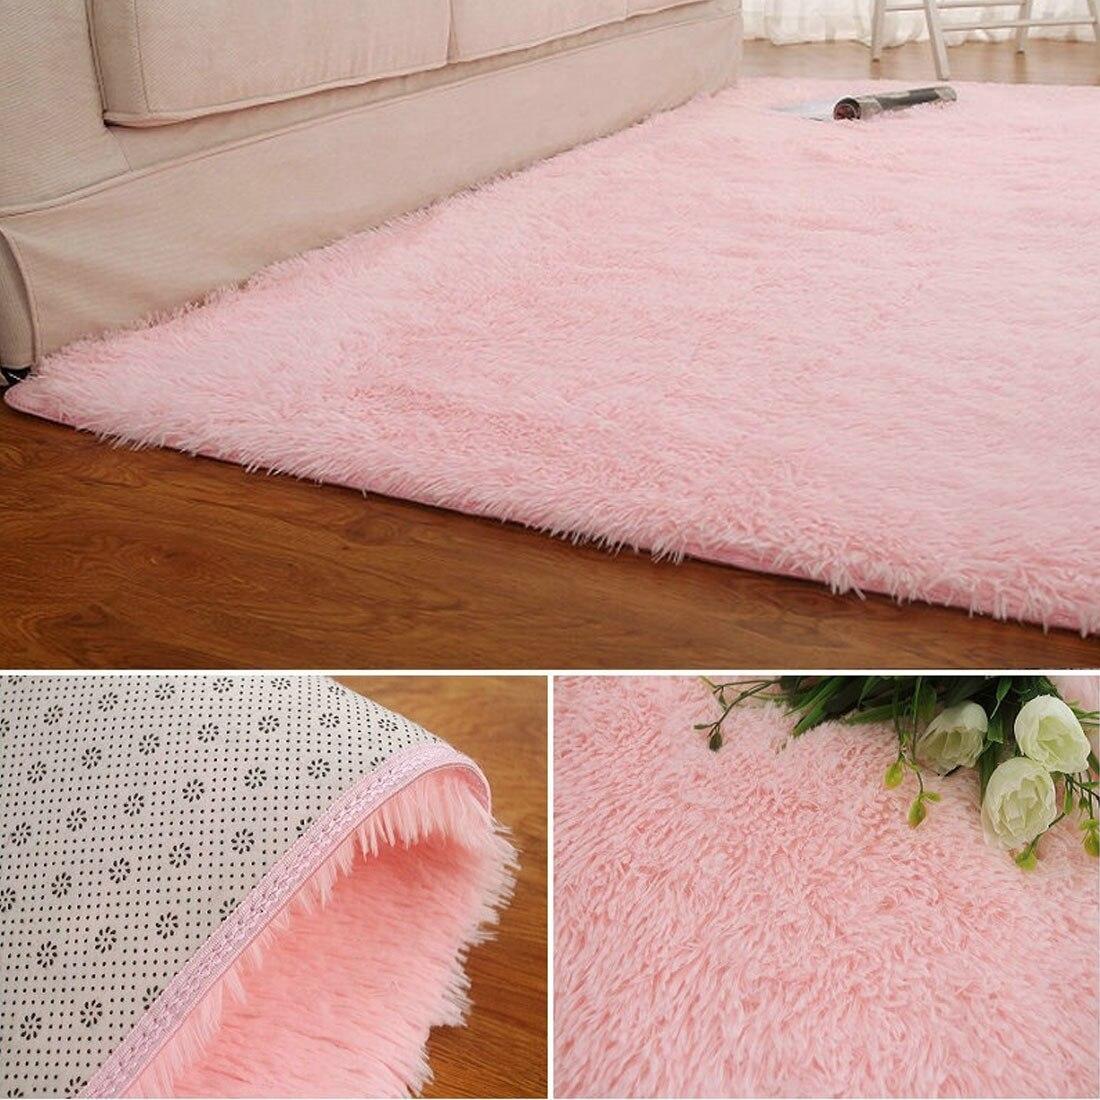 Anti Skid Fluffy Shaggy Area Rug Home Room Carpet Floor Mats